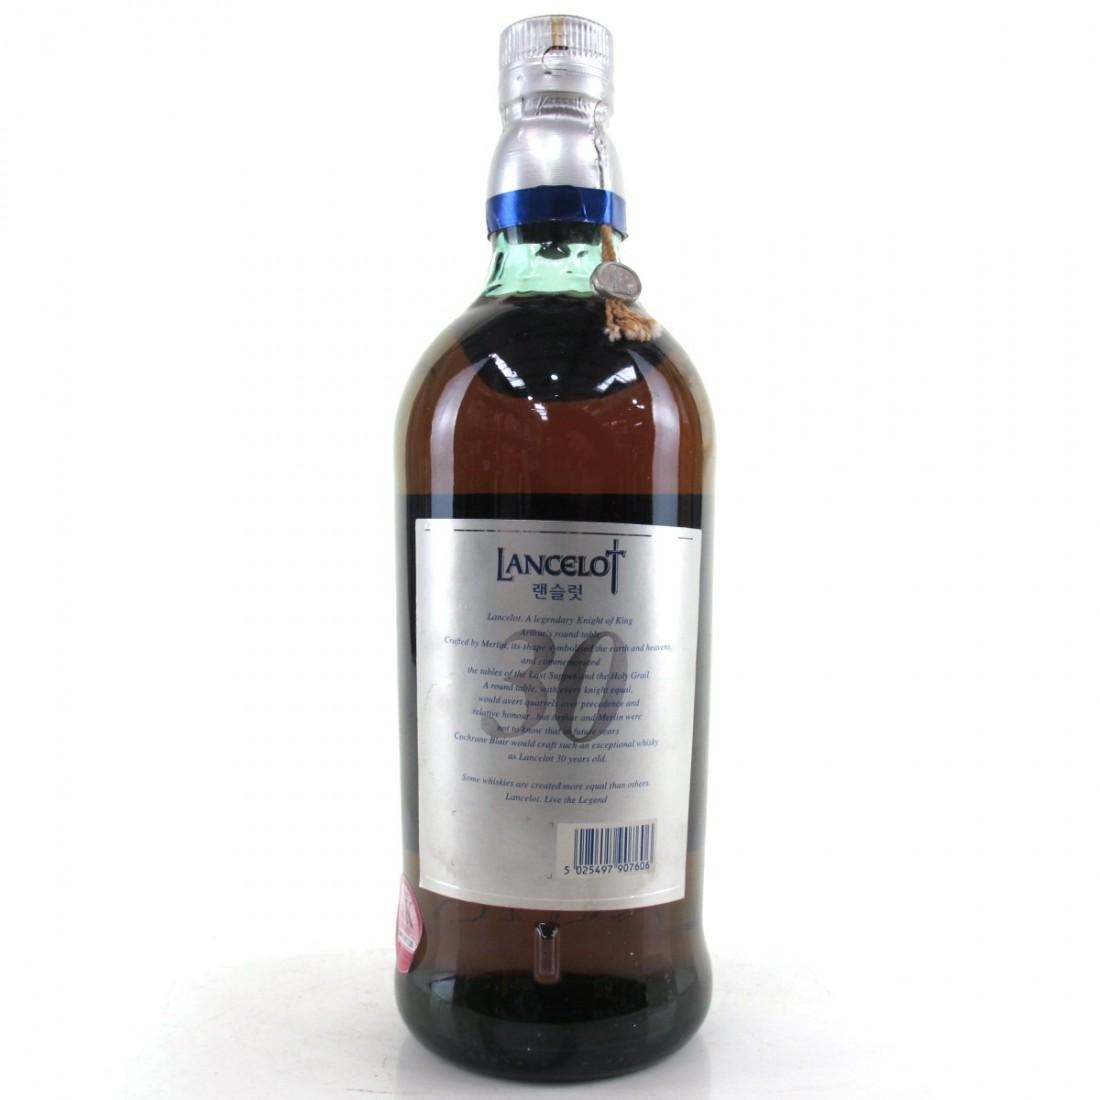 Lancelot 30 Year Old Rarest Edition